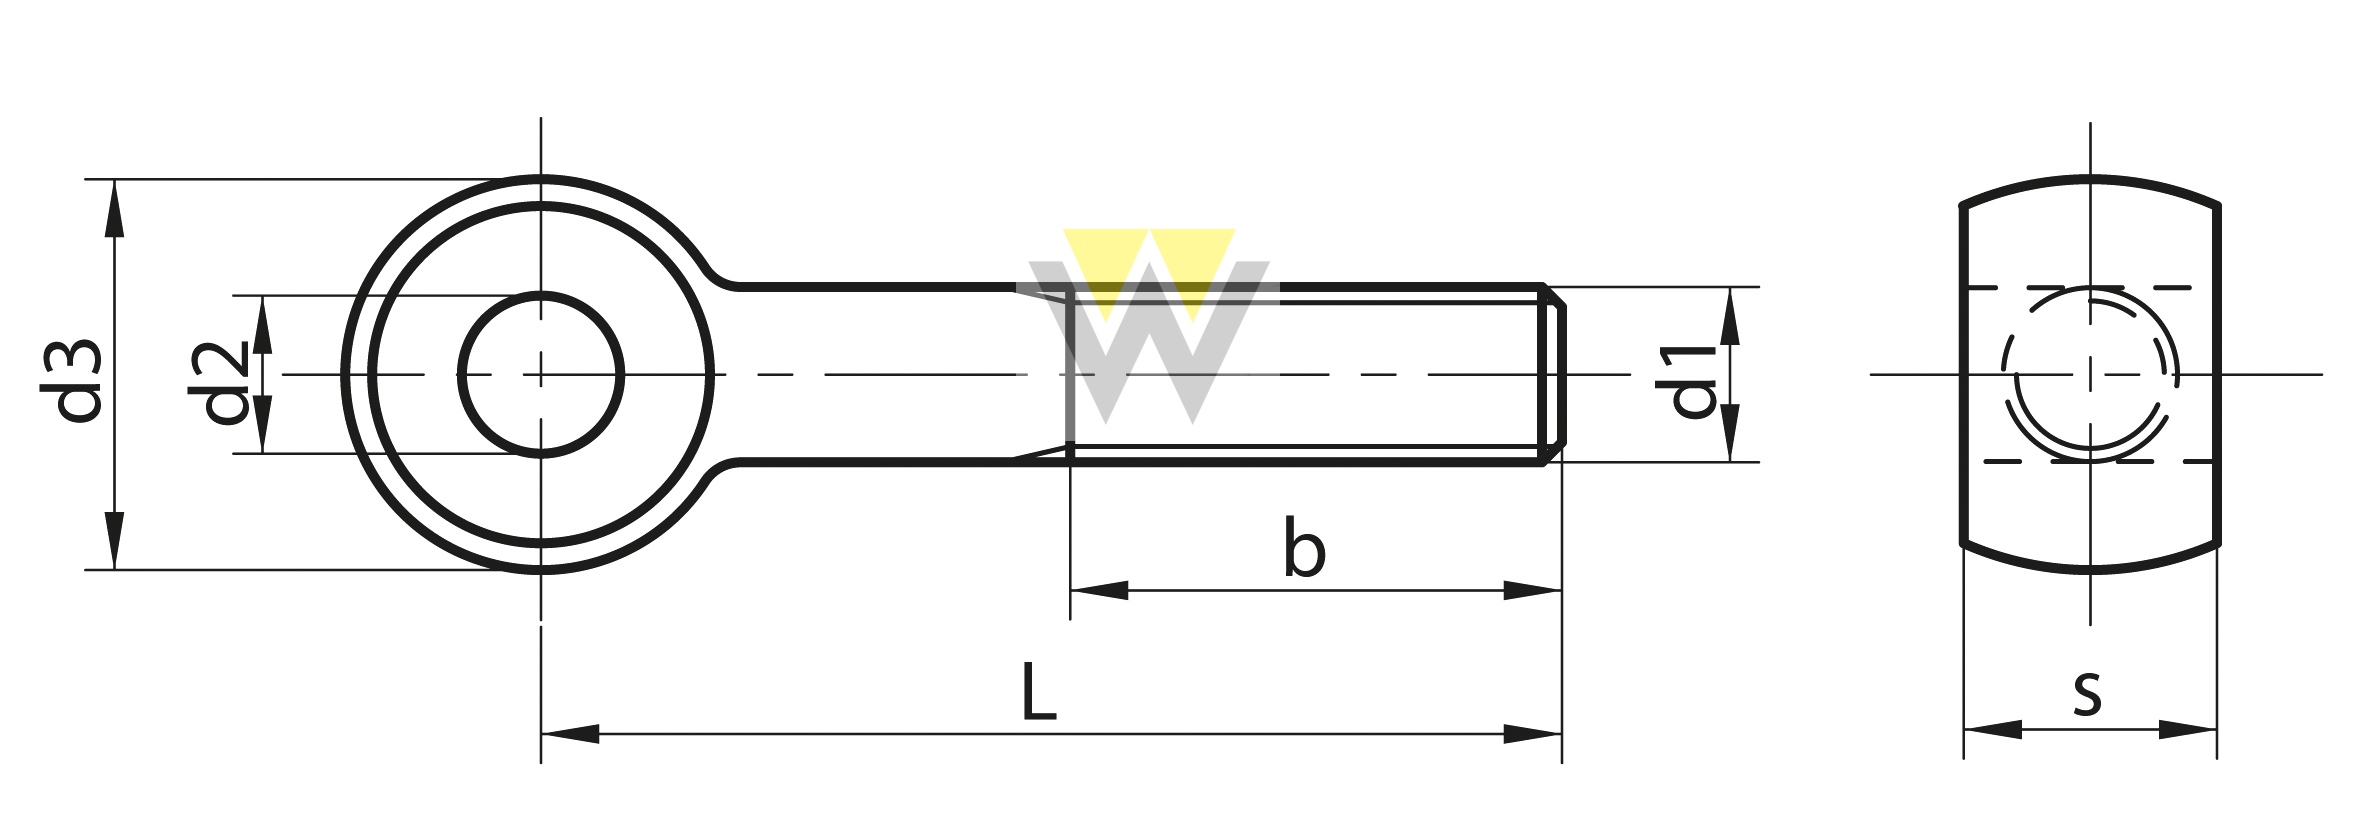 WERCHEM_DIN444_drawing